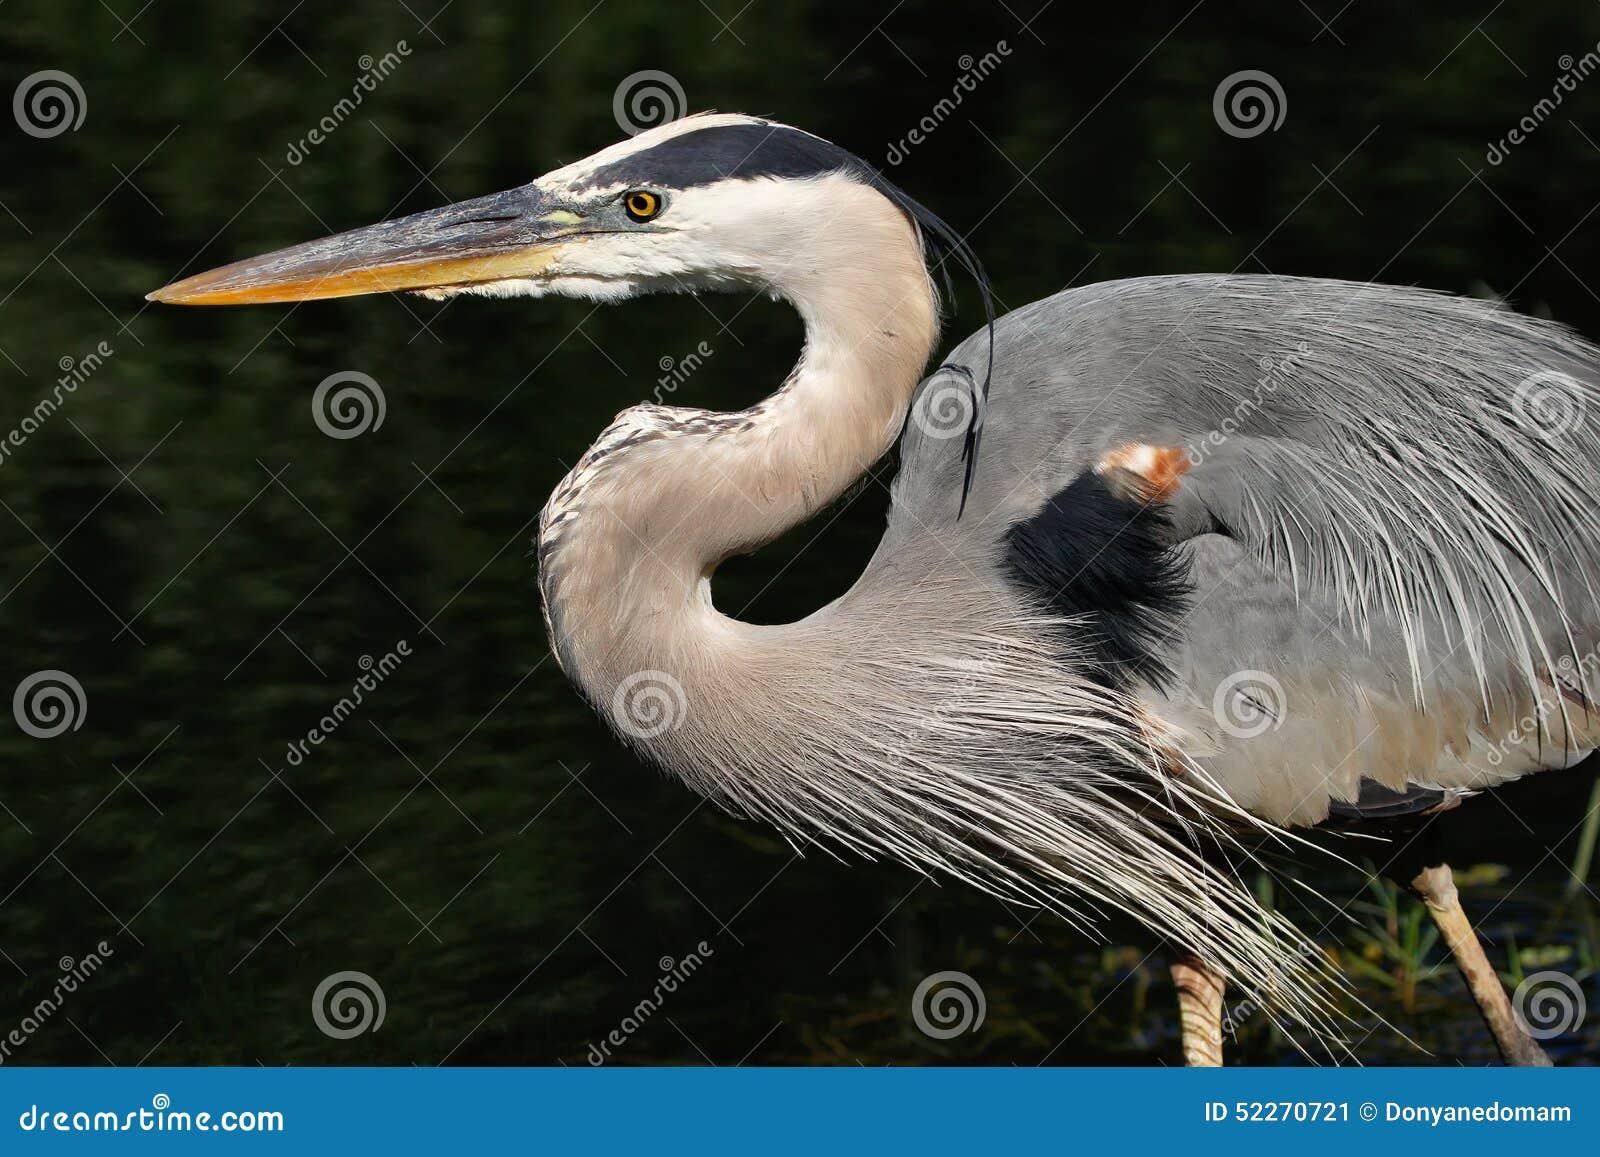 Portrait of Great blue heron